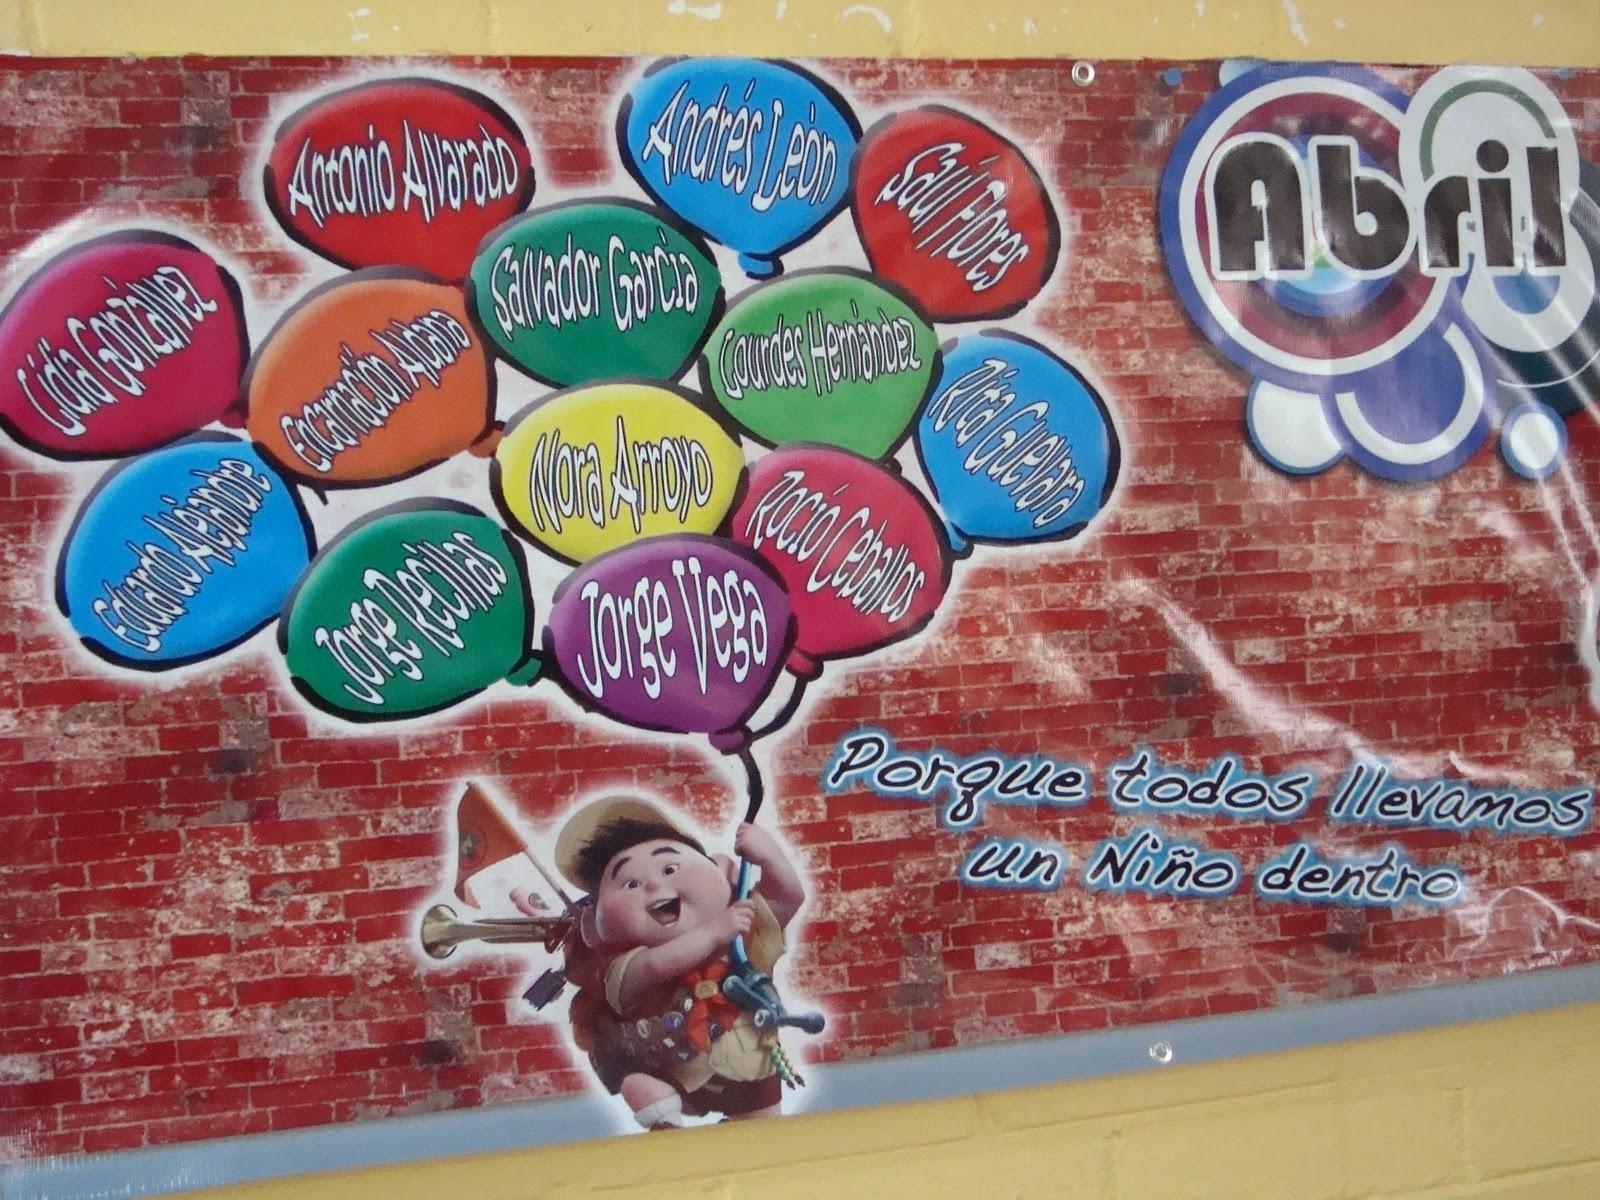 Periodico Mural Del Mes De Abril